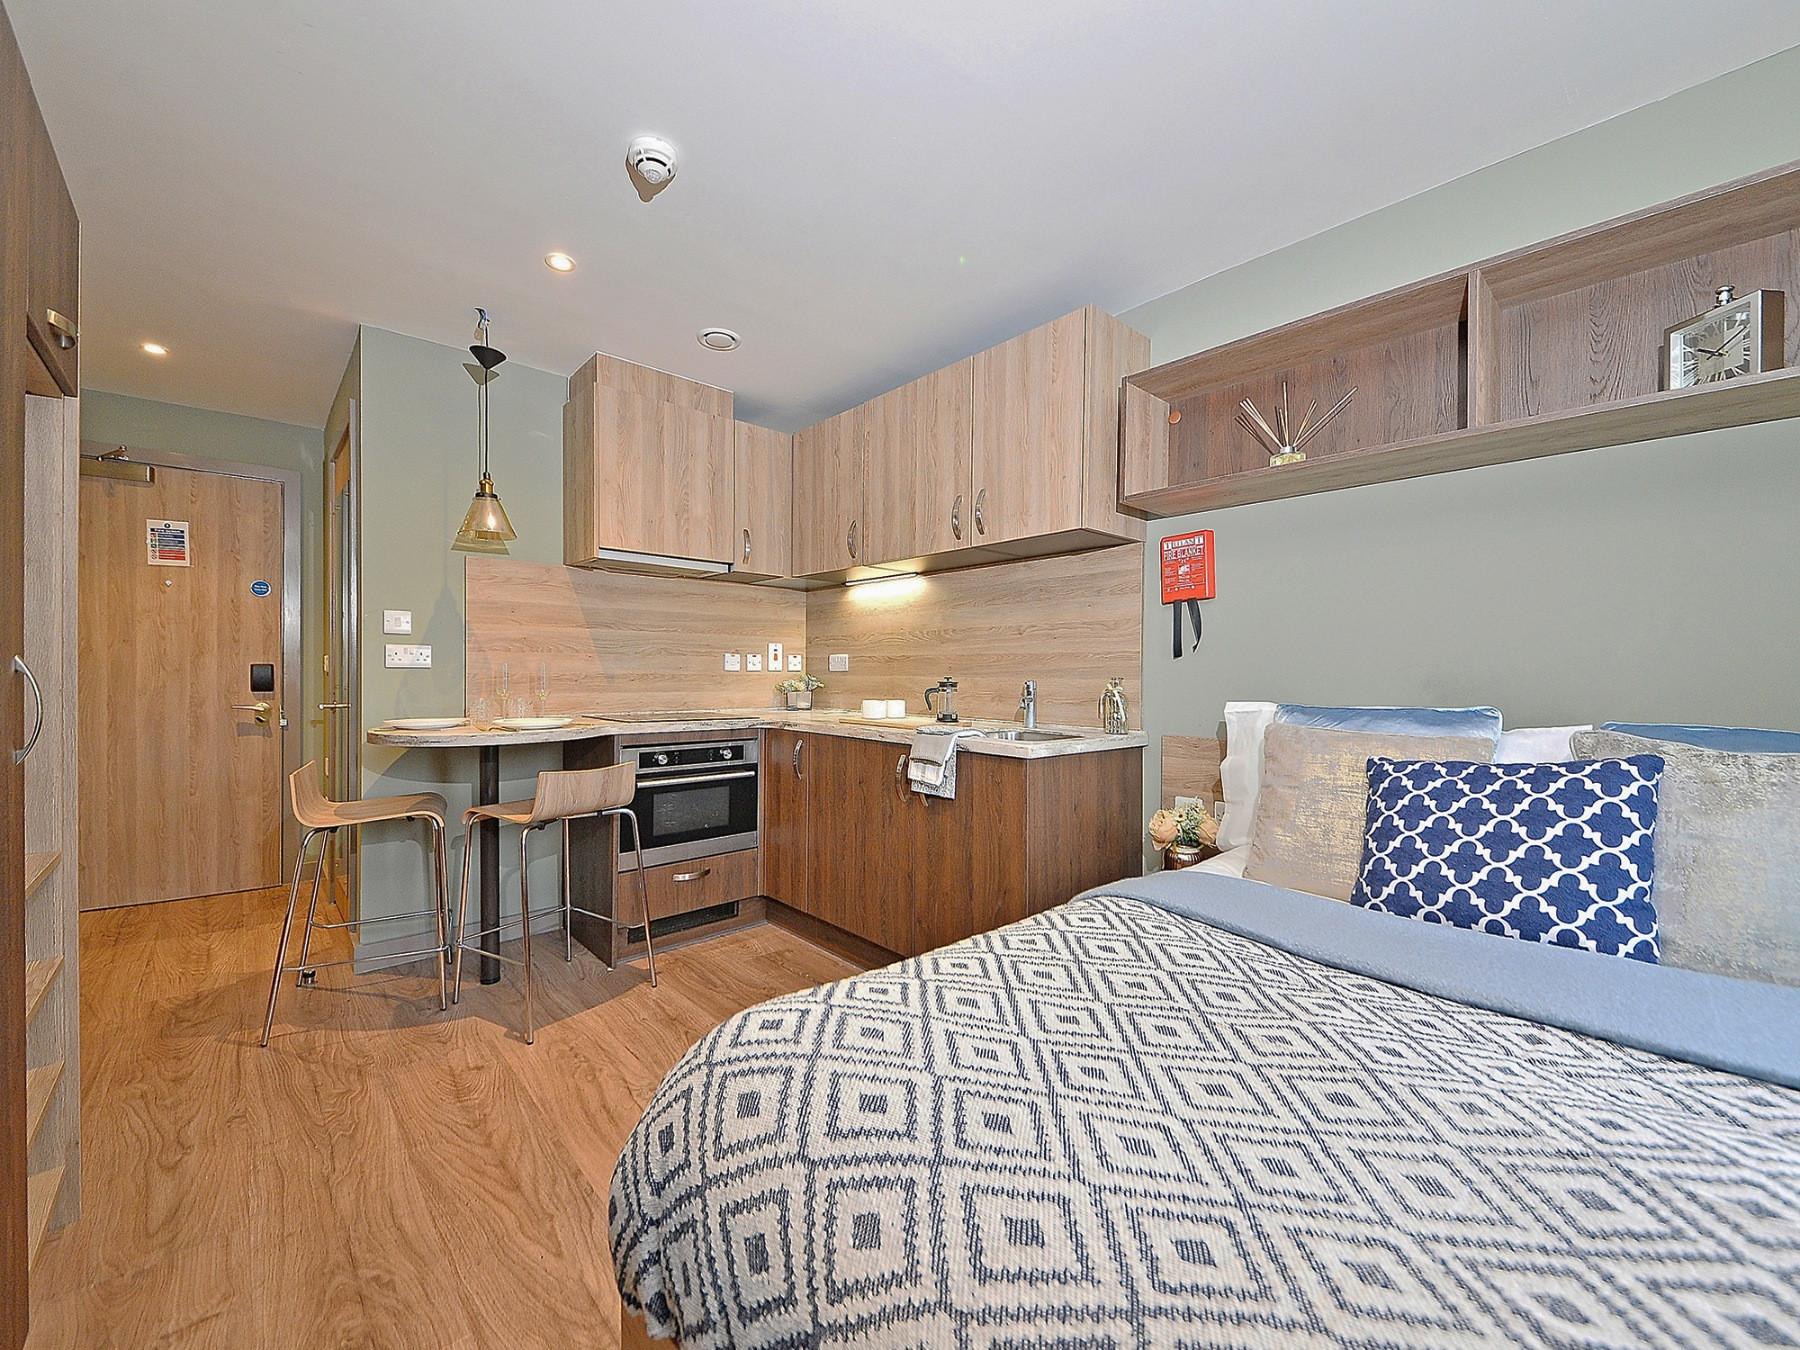 Fontenoy Apartments, Fontenoy Street, Liverpool, Liverpool